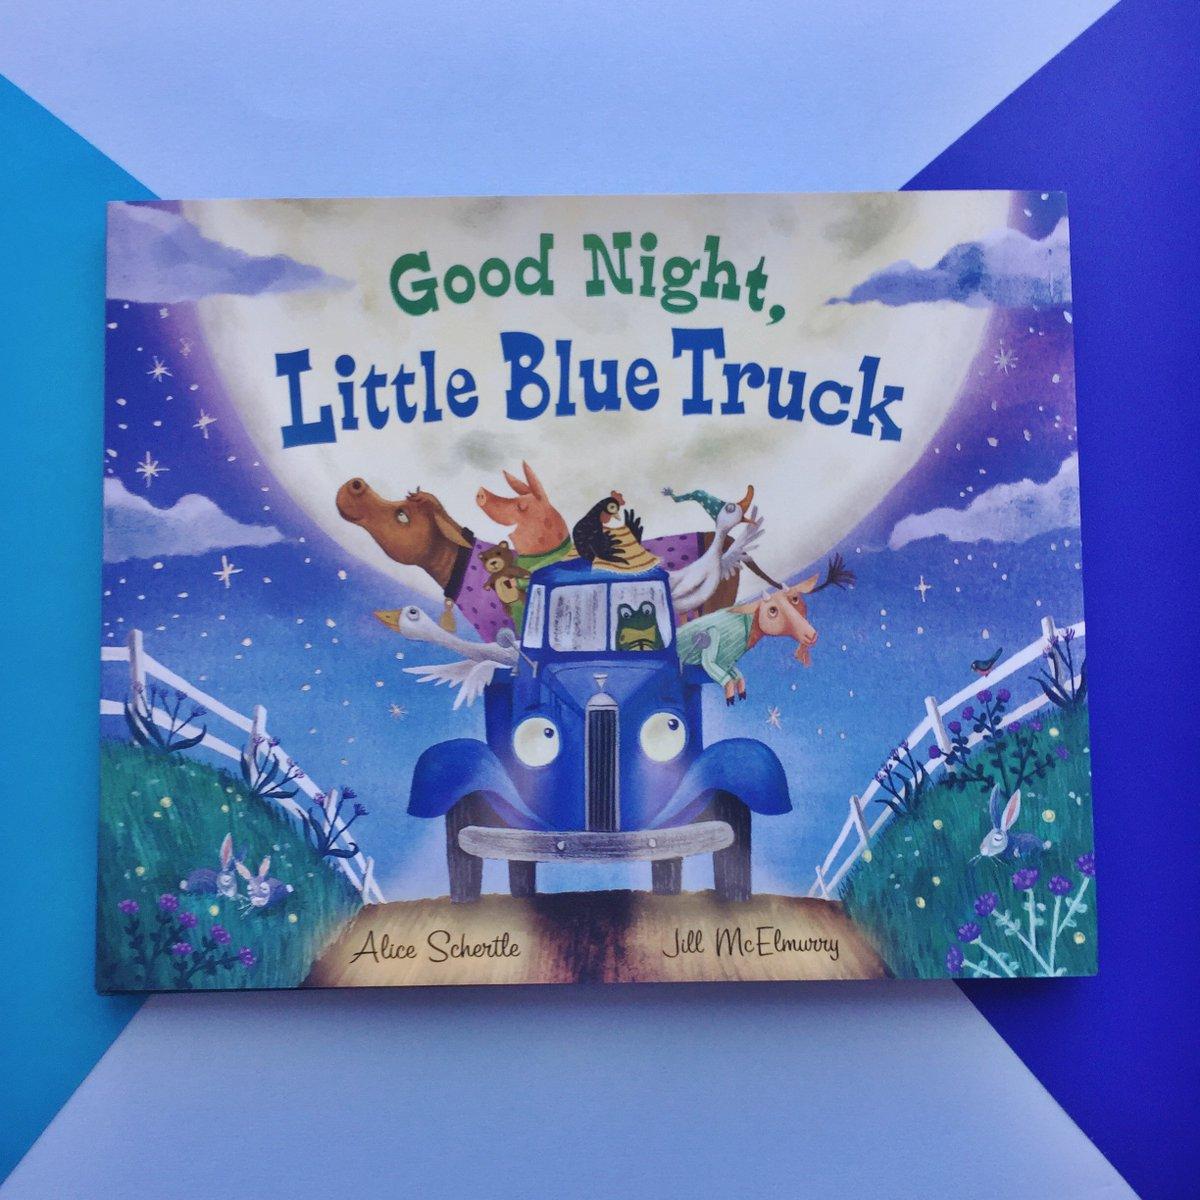 Wind down your evening with GOOD NIGHT, LITTLE BLUE TRUCK. #LittleBlueTruck #kidlit